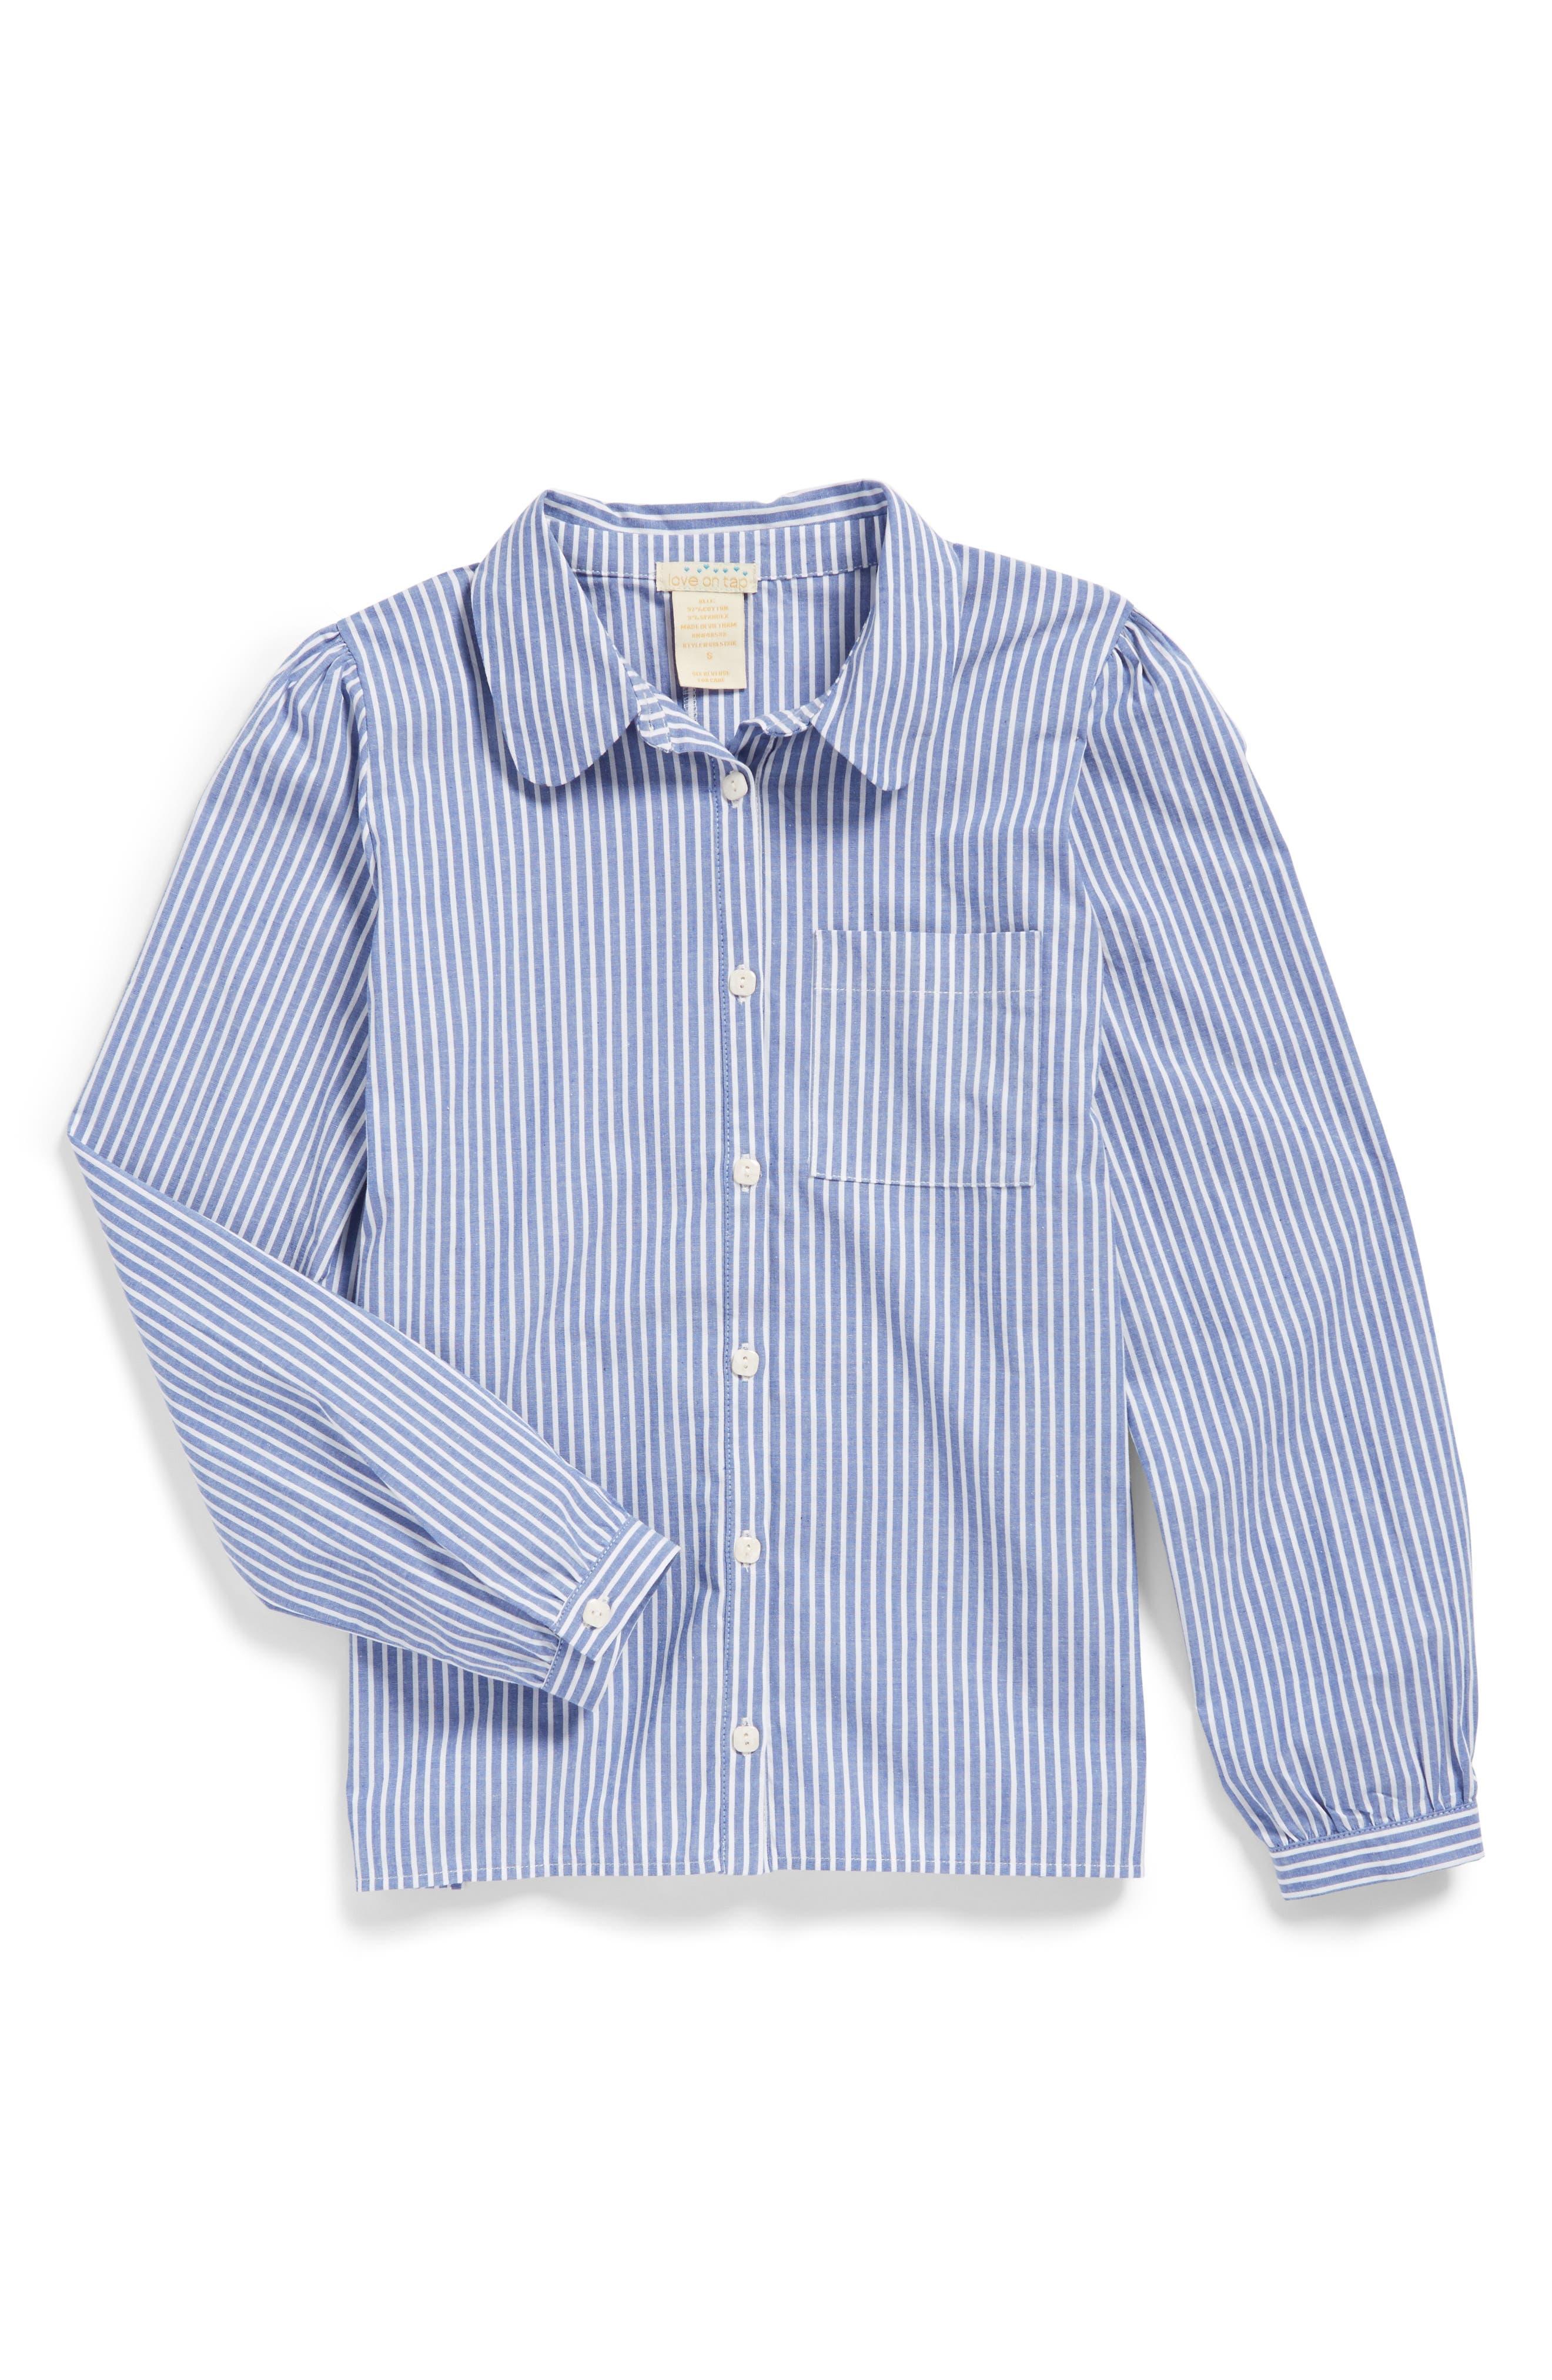 Stripe Stretch Cotton Shirt,                         Main,                         color, 430